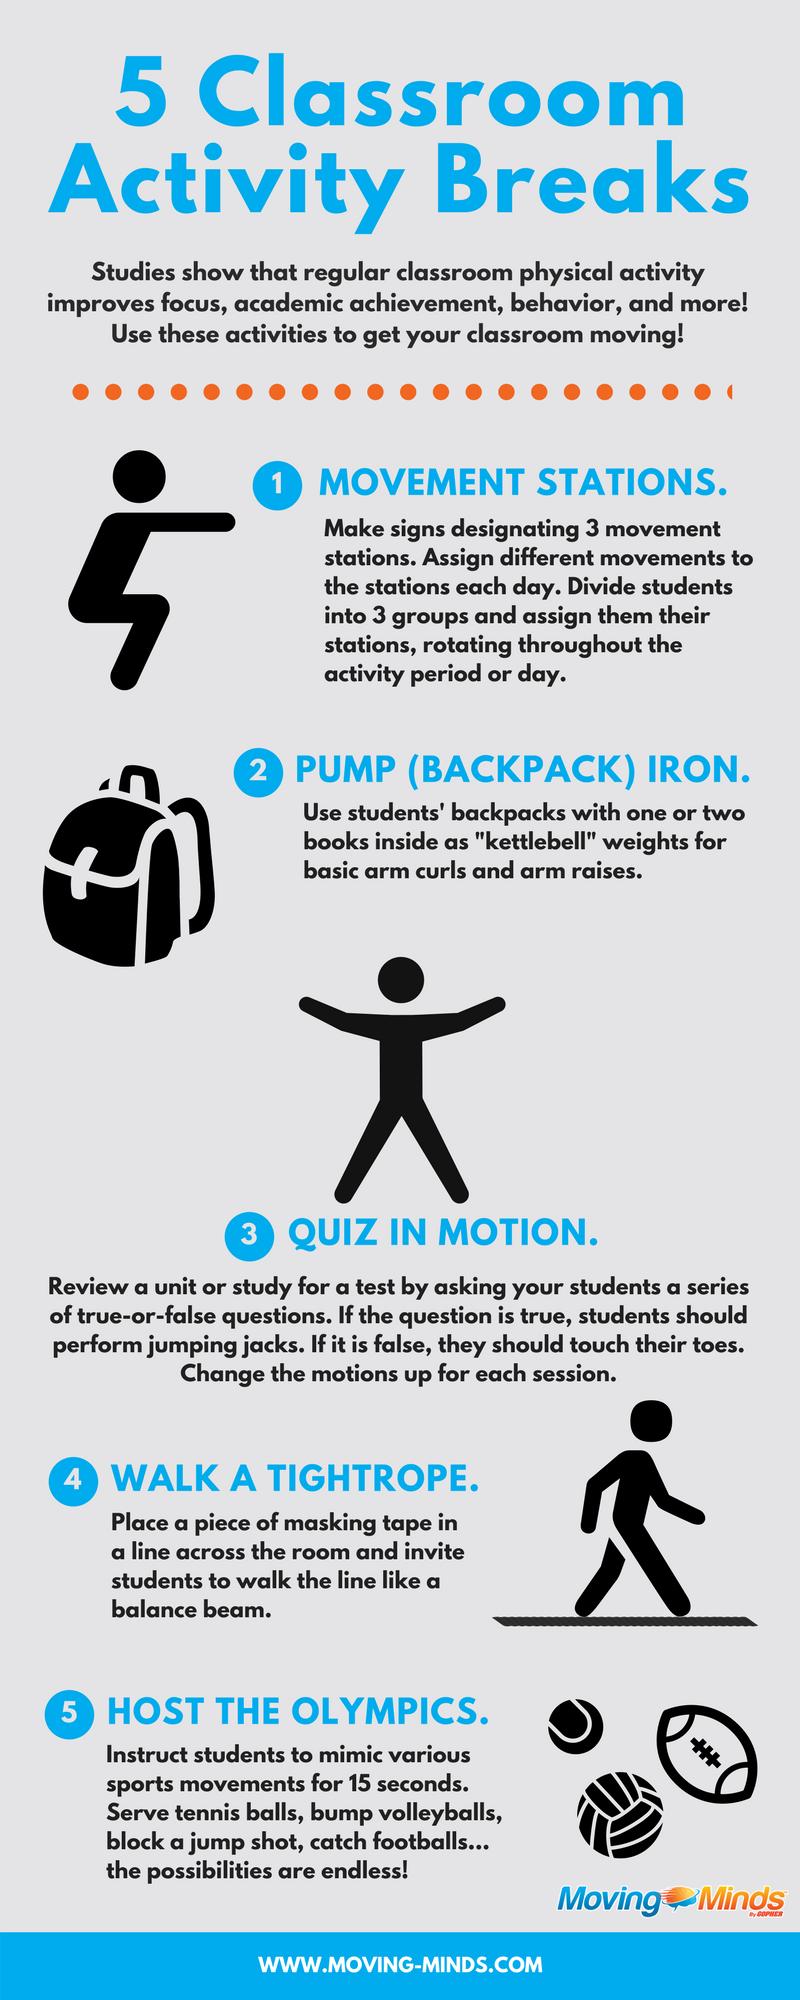 Classroom Activity Breaks Infographic